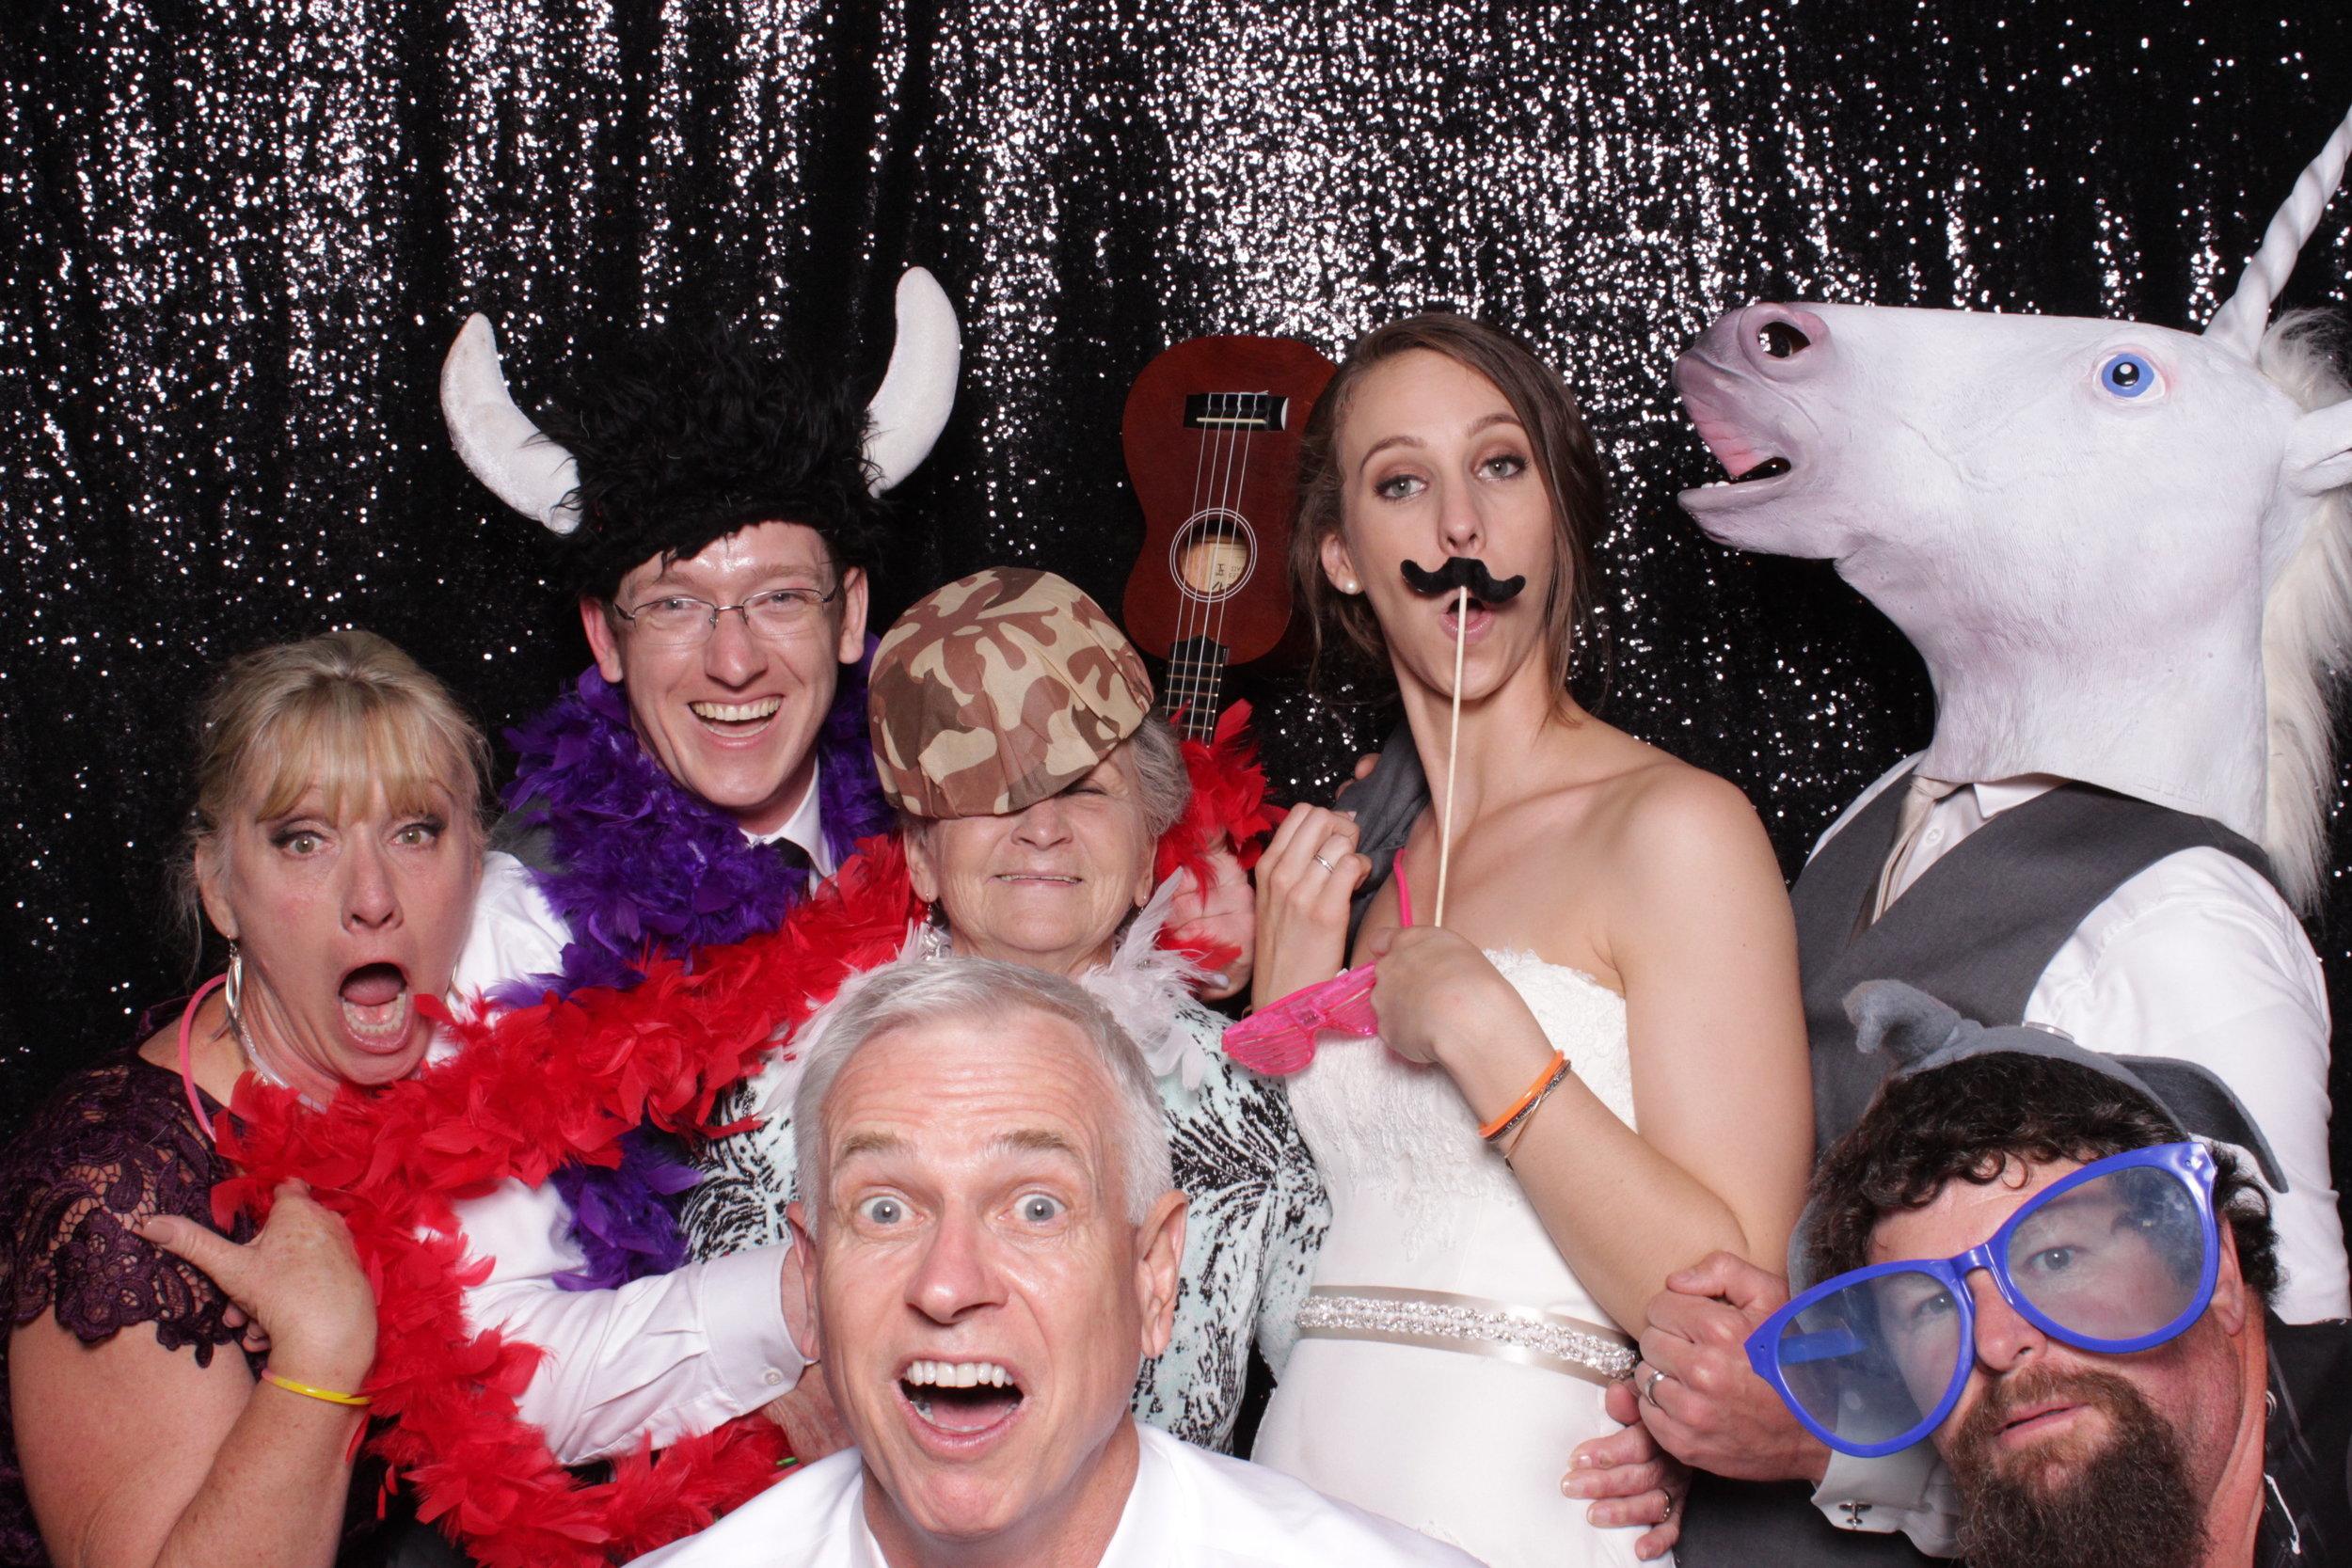 wedding-photo-booth-chico-rental-bride-grandma